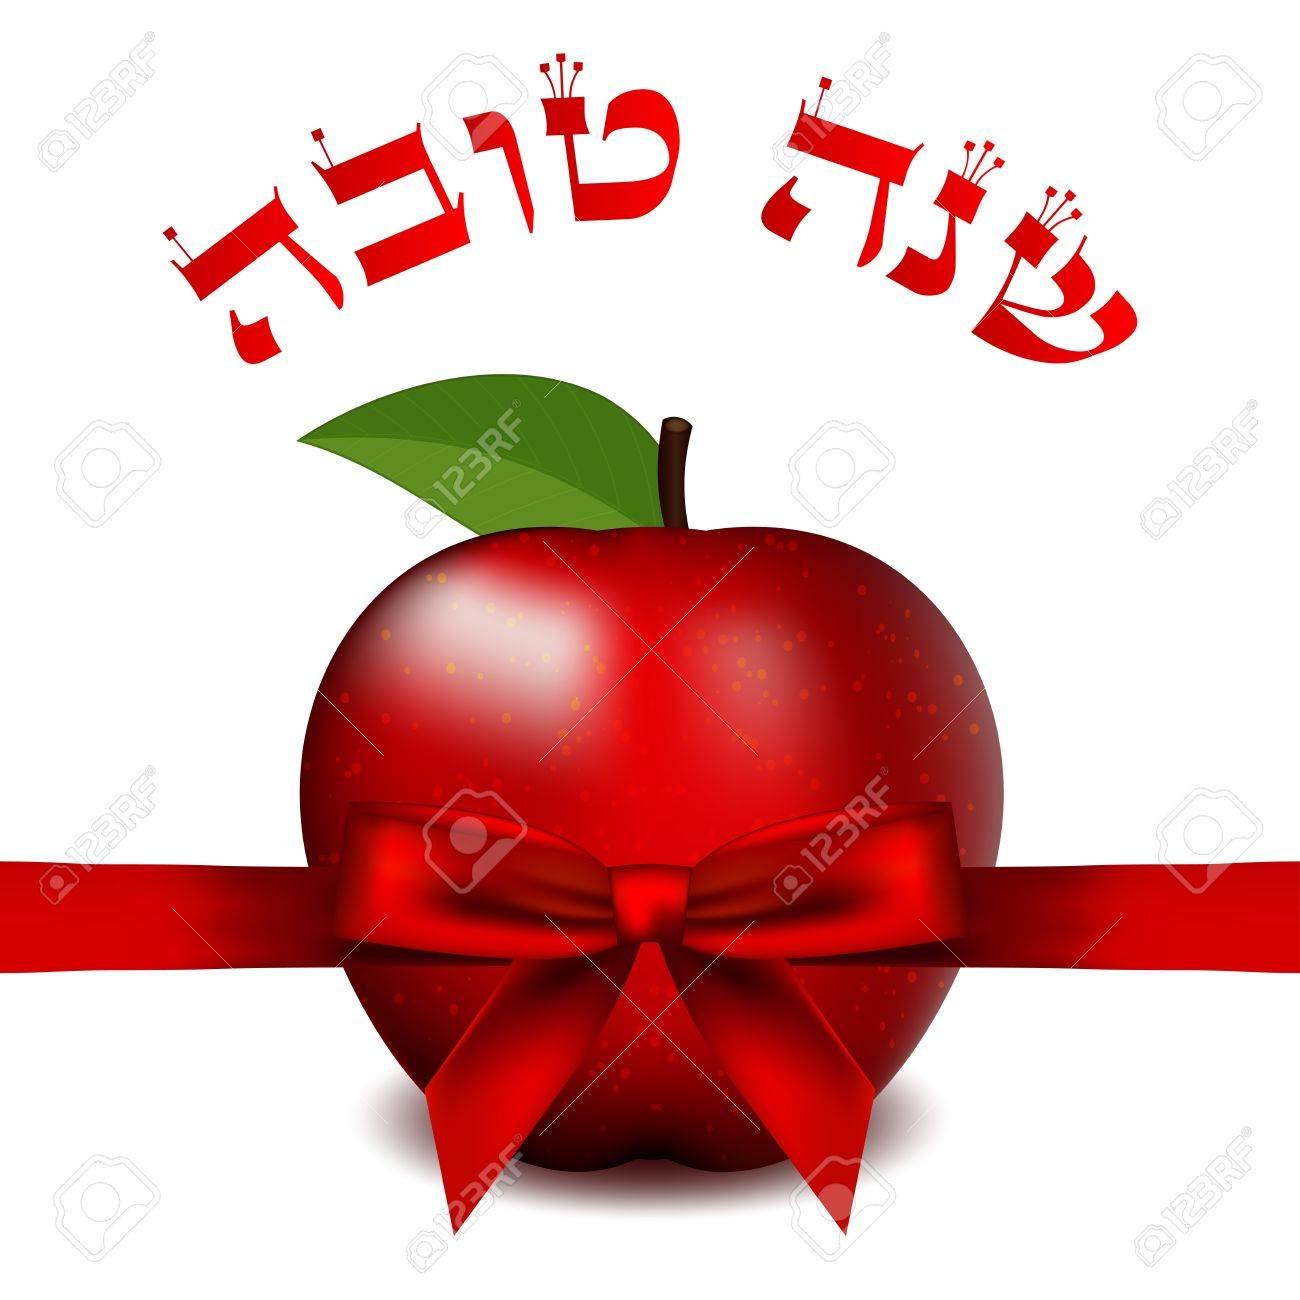 Shana tova card royalty free cliparts vectors and stock shana tova card stock vector 15766878 m4hsunfo